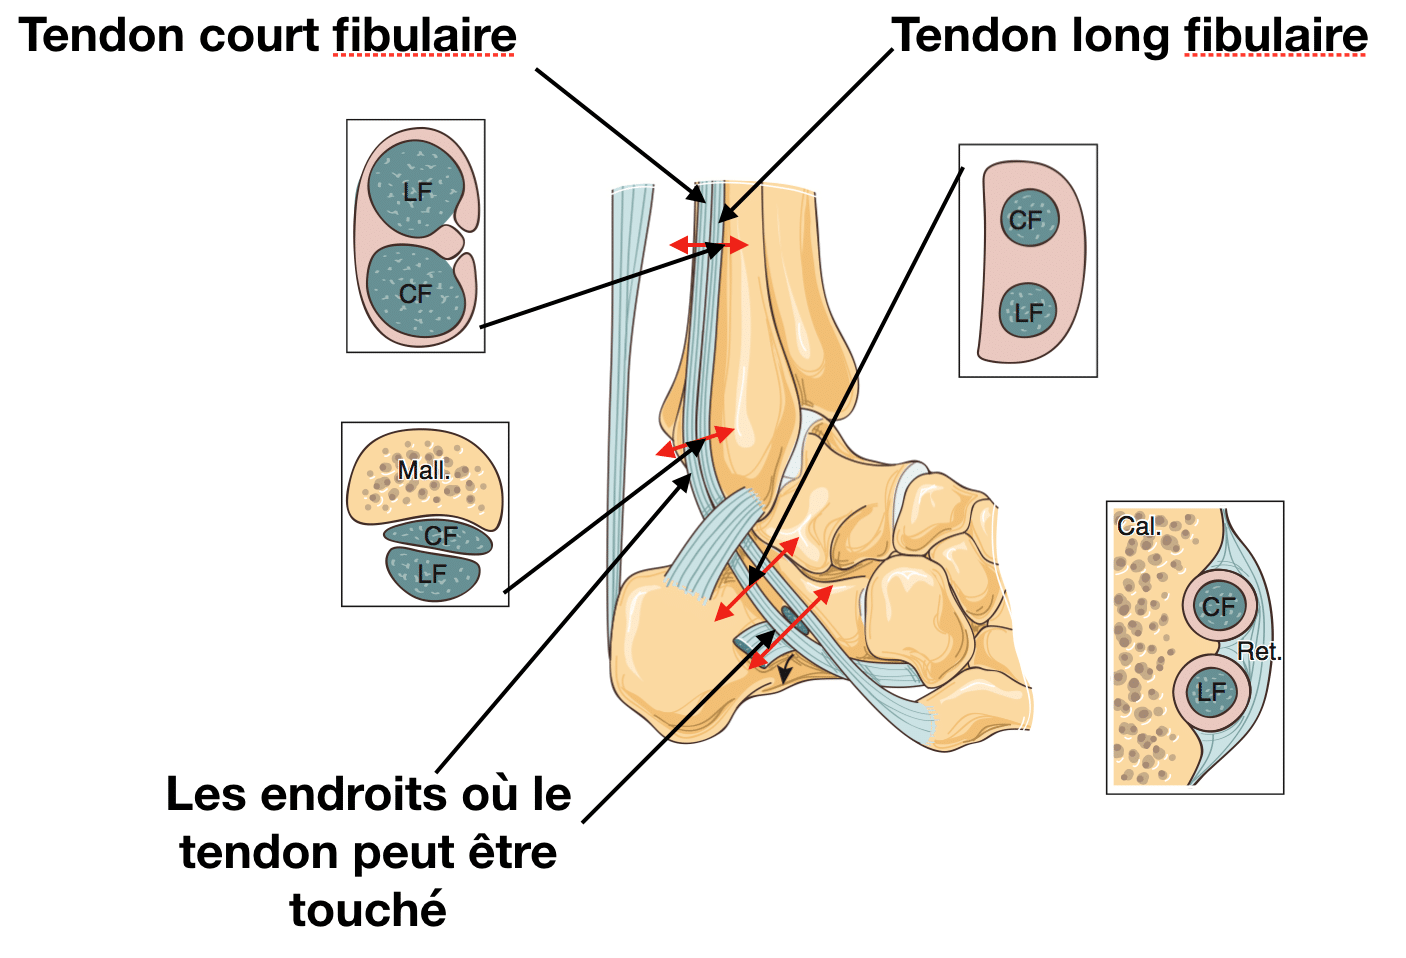 Tendon fibulaire : anatomie